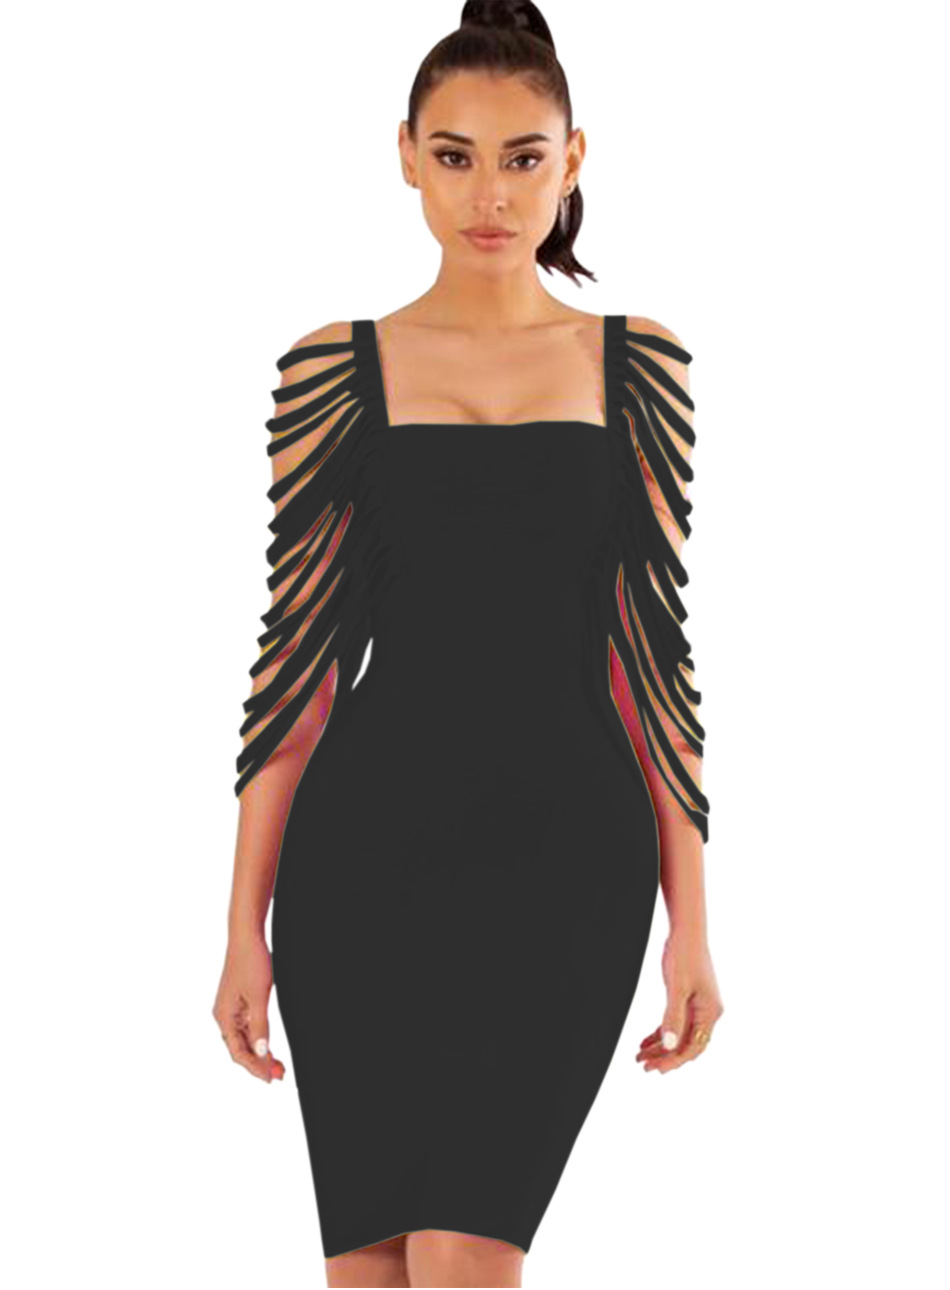 Woman Tassel Sleeve Slim Bodycon Dress Knee Length Summer Elegant Party Dress Knit Sheath Sexy Club Outfit Women Vestidos Black in Dresses from Women 39 s Clothing